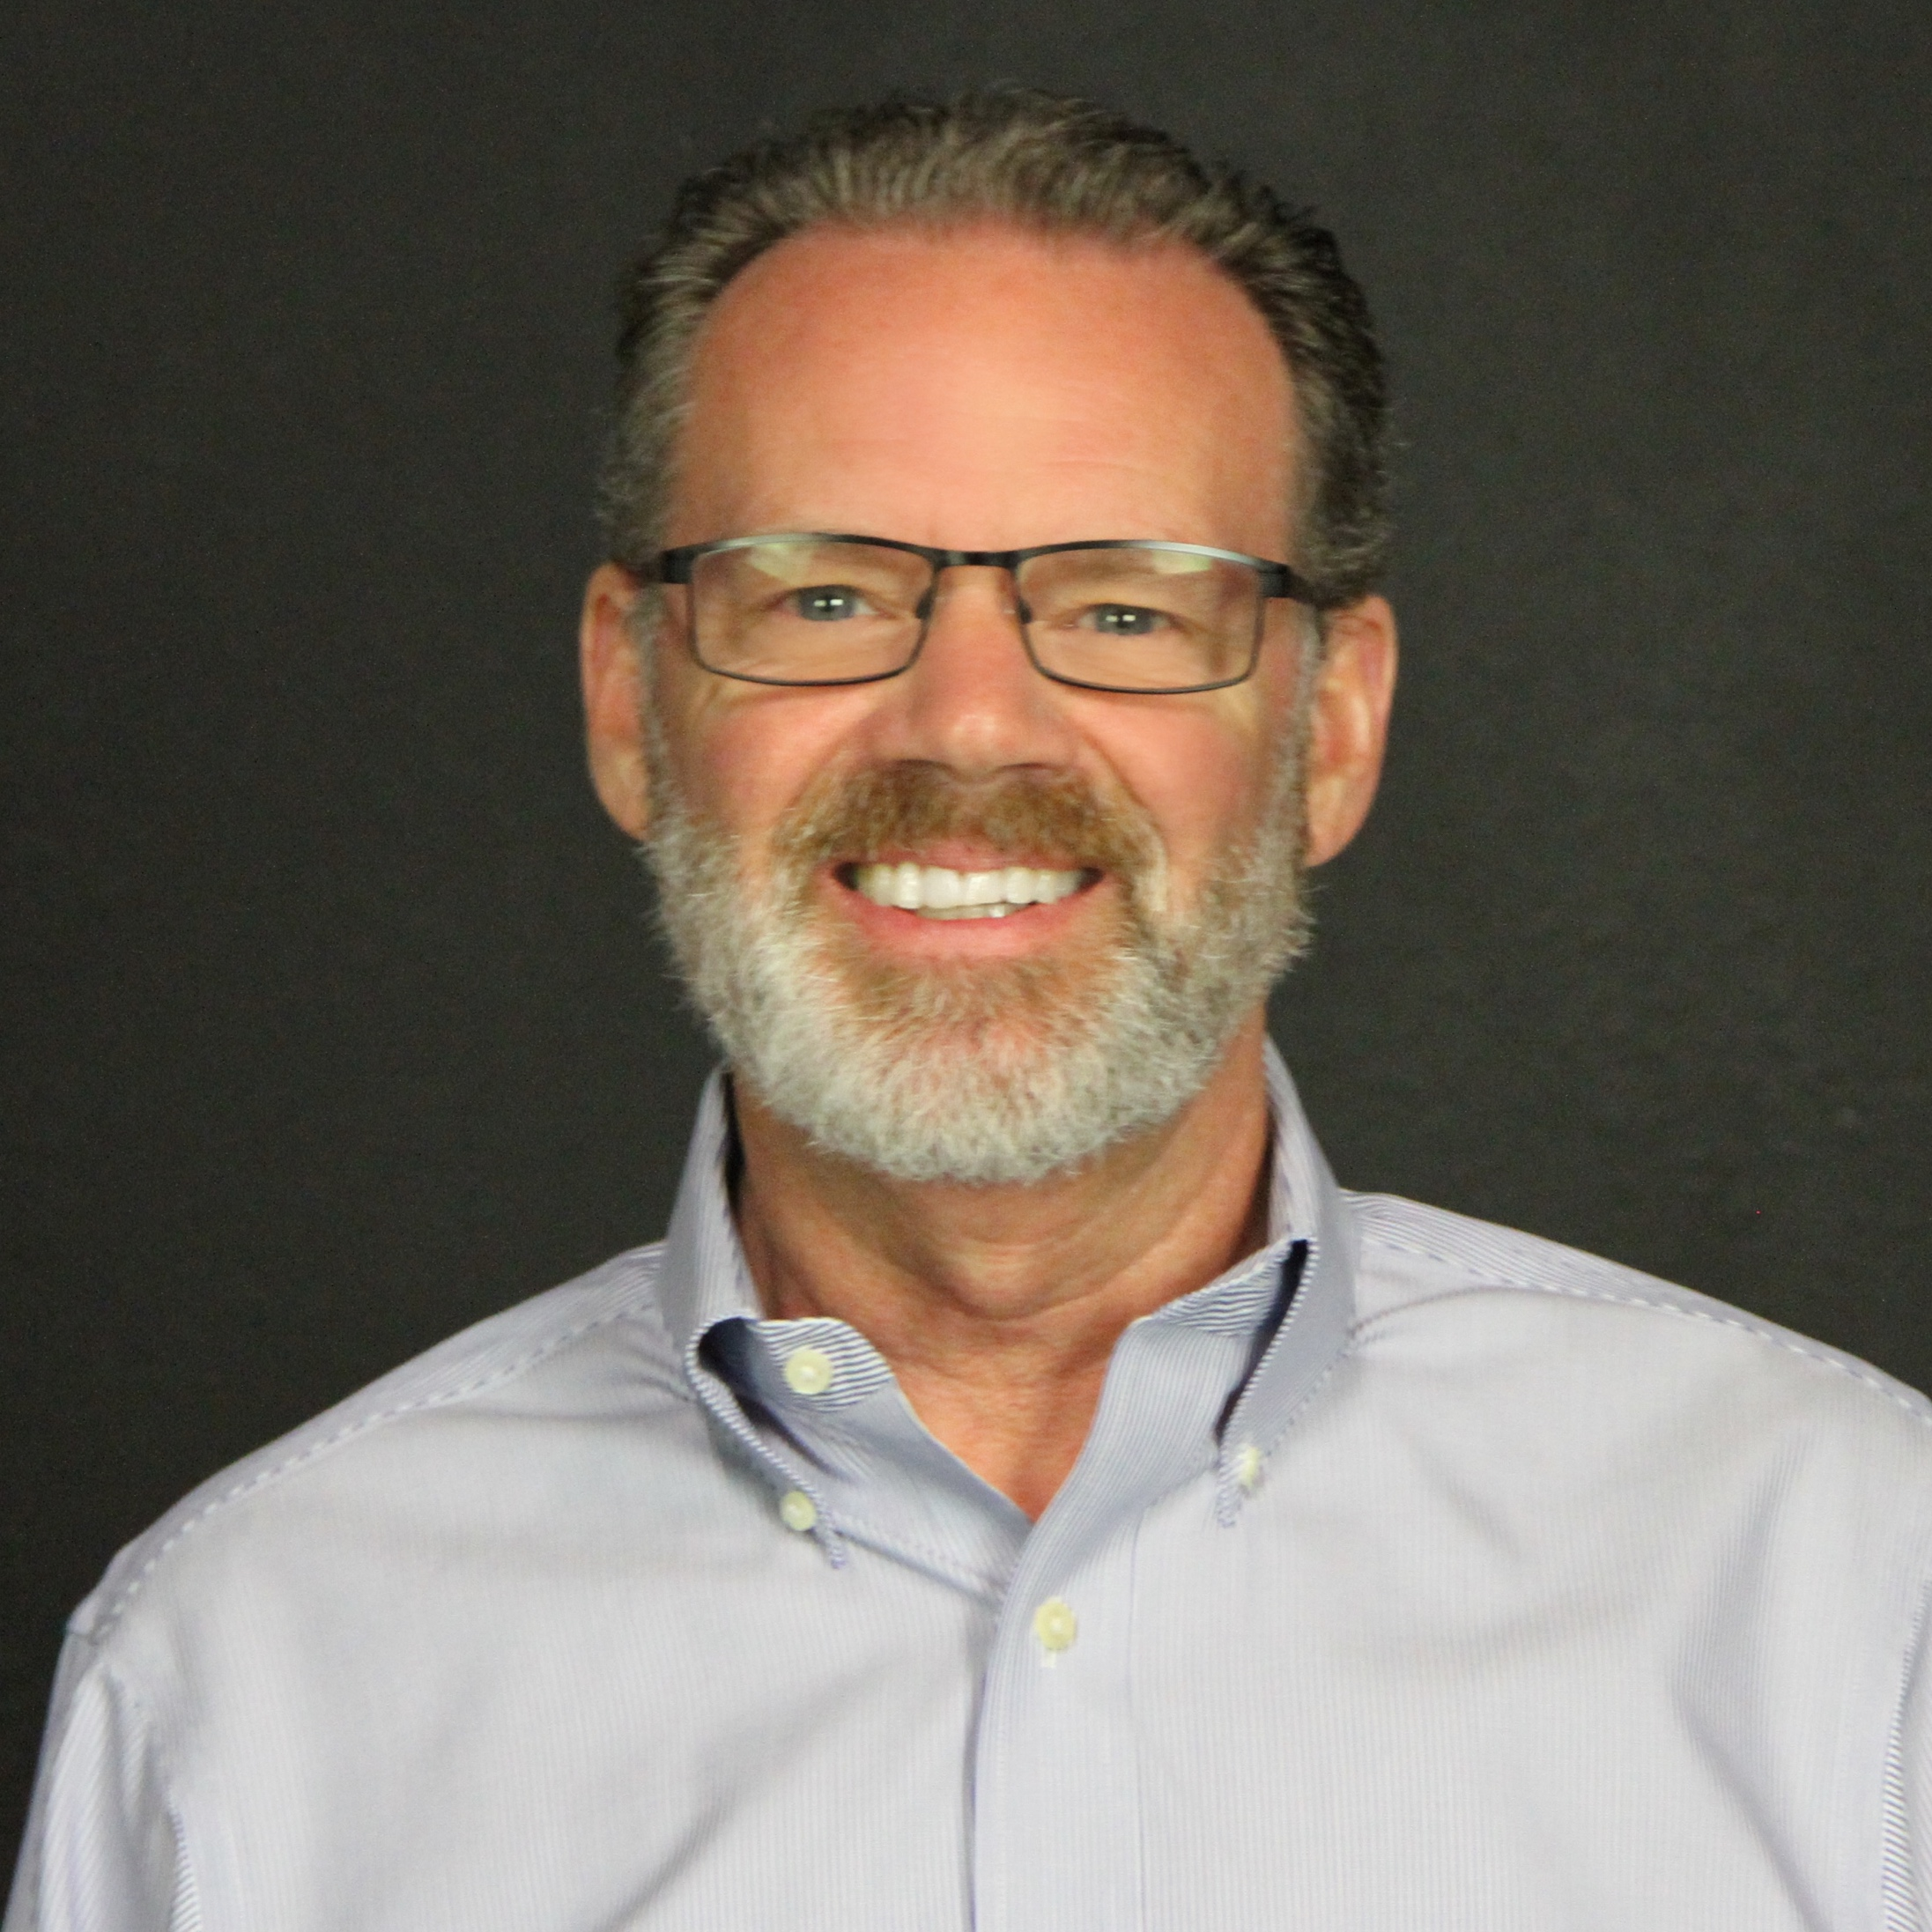 Greg Perrine